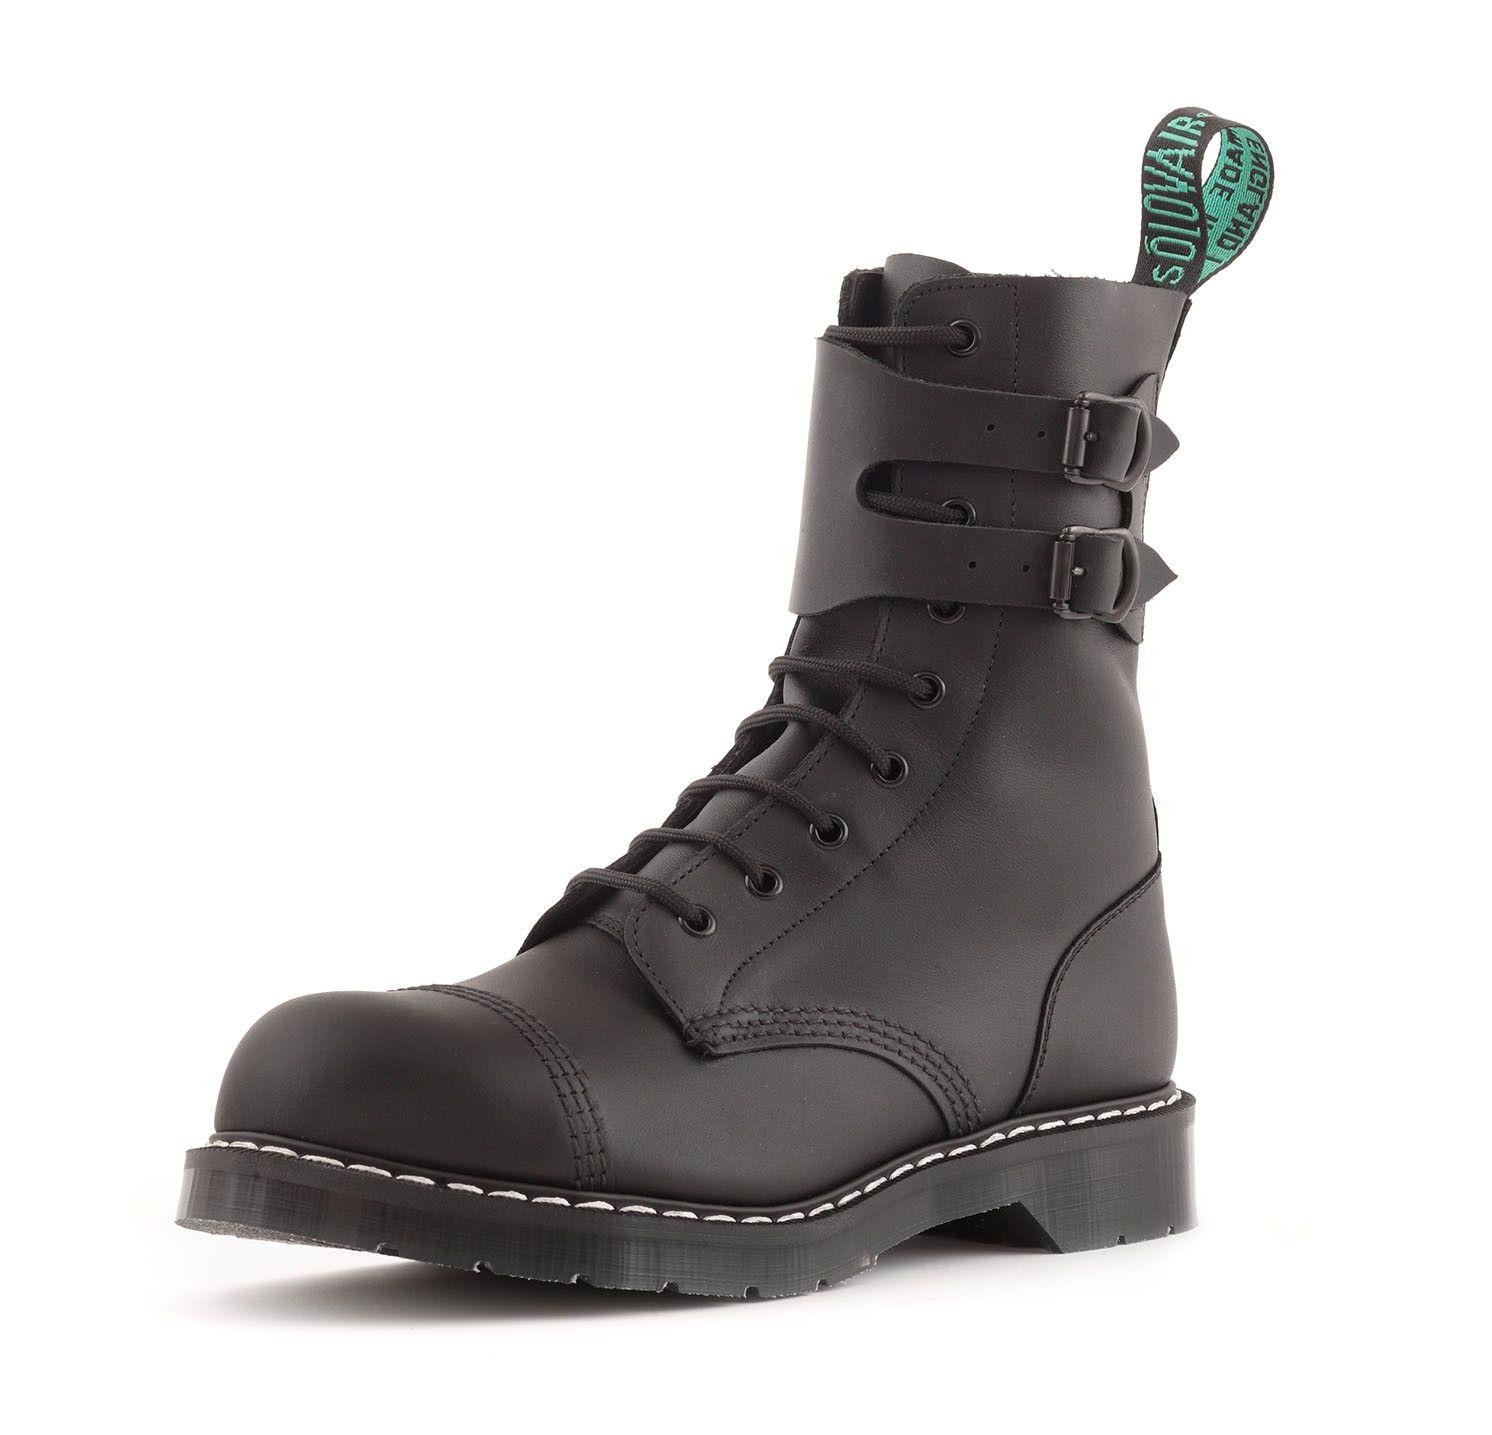 Classic 9 Eye Steel Toe Buckle Boot in Greasy Black. Buckle BootsMen's  BootsShoe ...